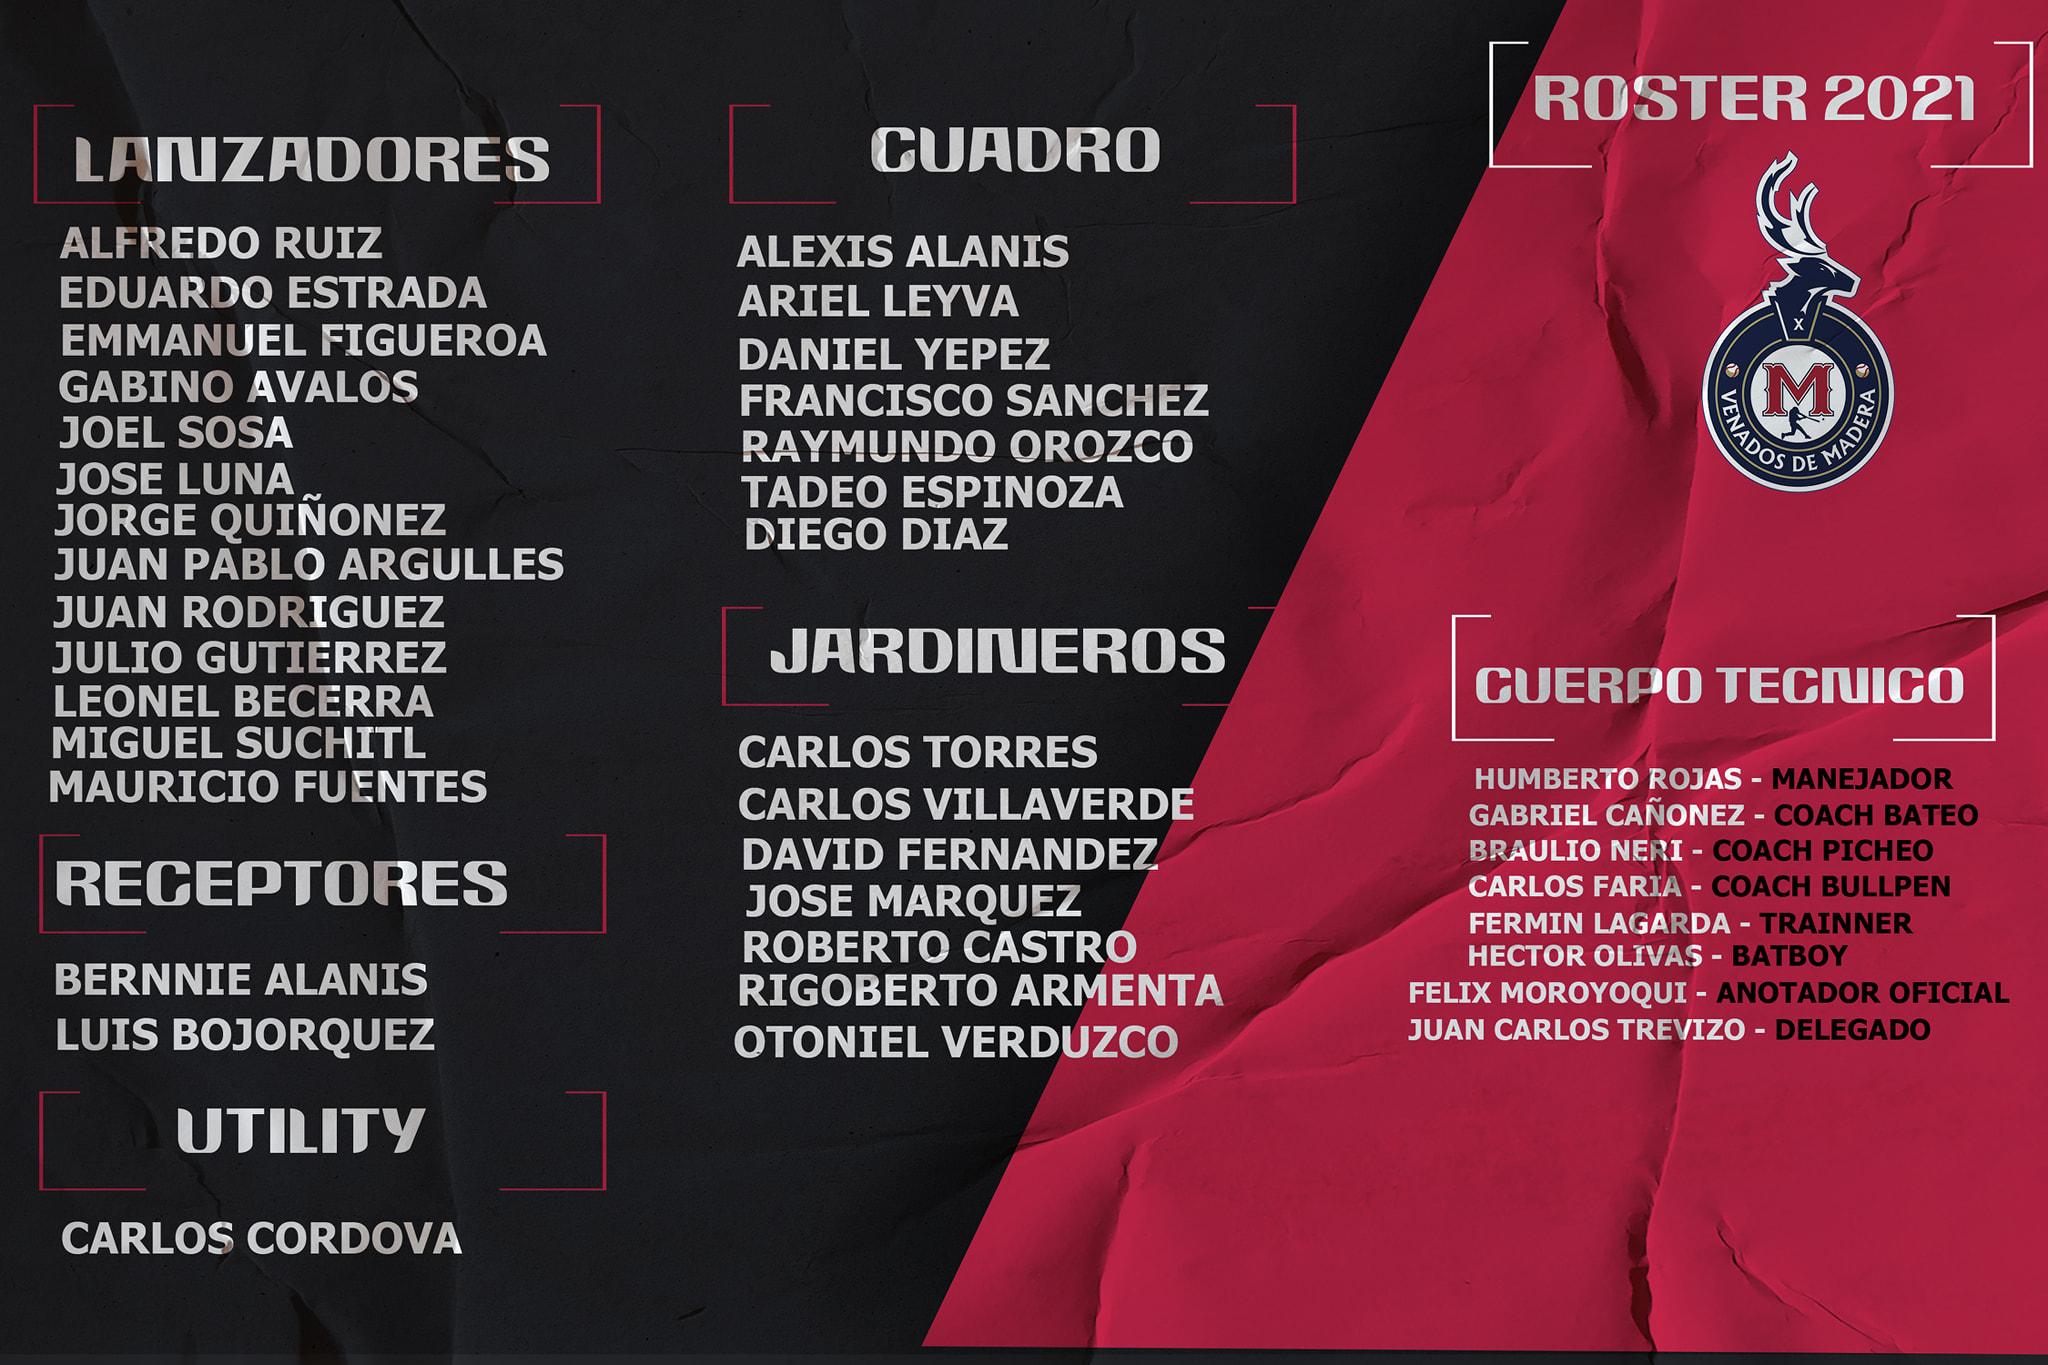 roster-temporada-2021-campeonato-estatal-besibol-chihuahua-venados-madera